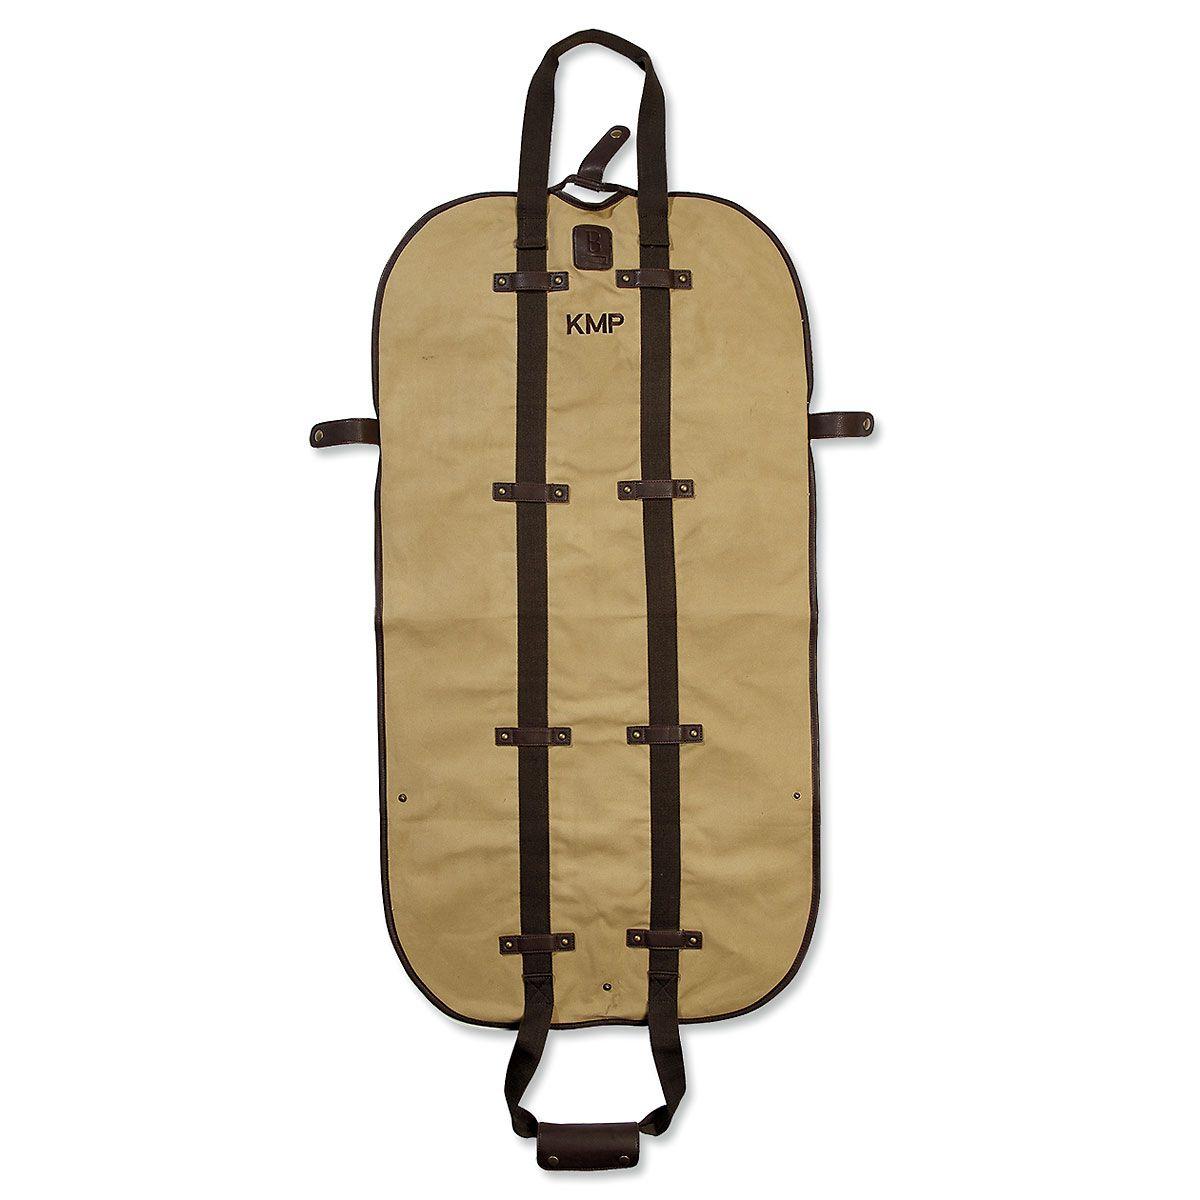 Personalized Garment Bag